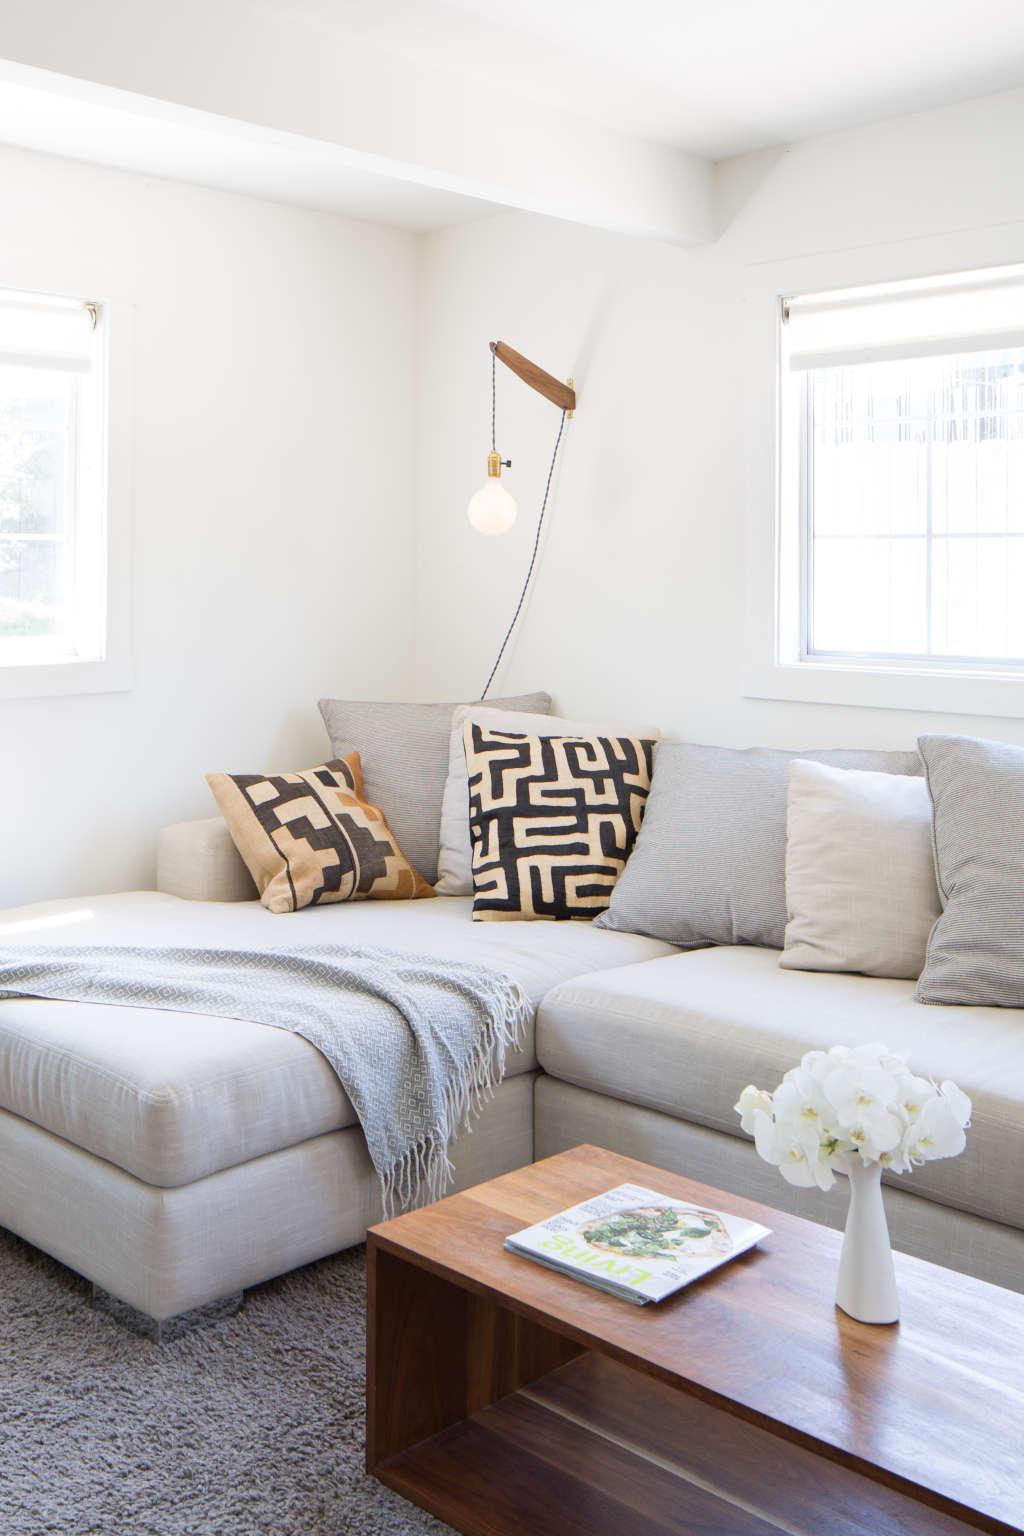 Apt Living Room Decor: Budget Fixes For Sagging Sofas